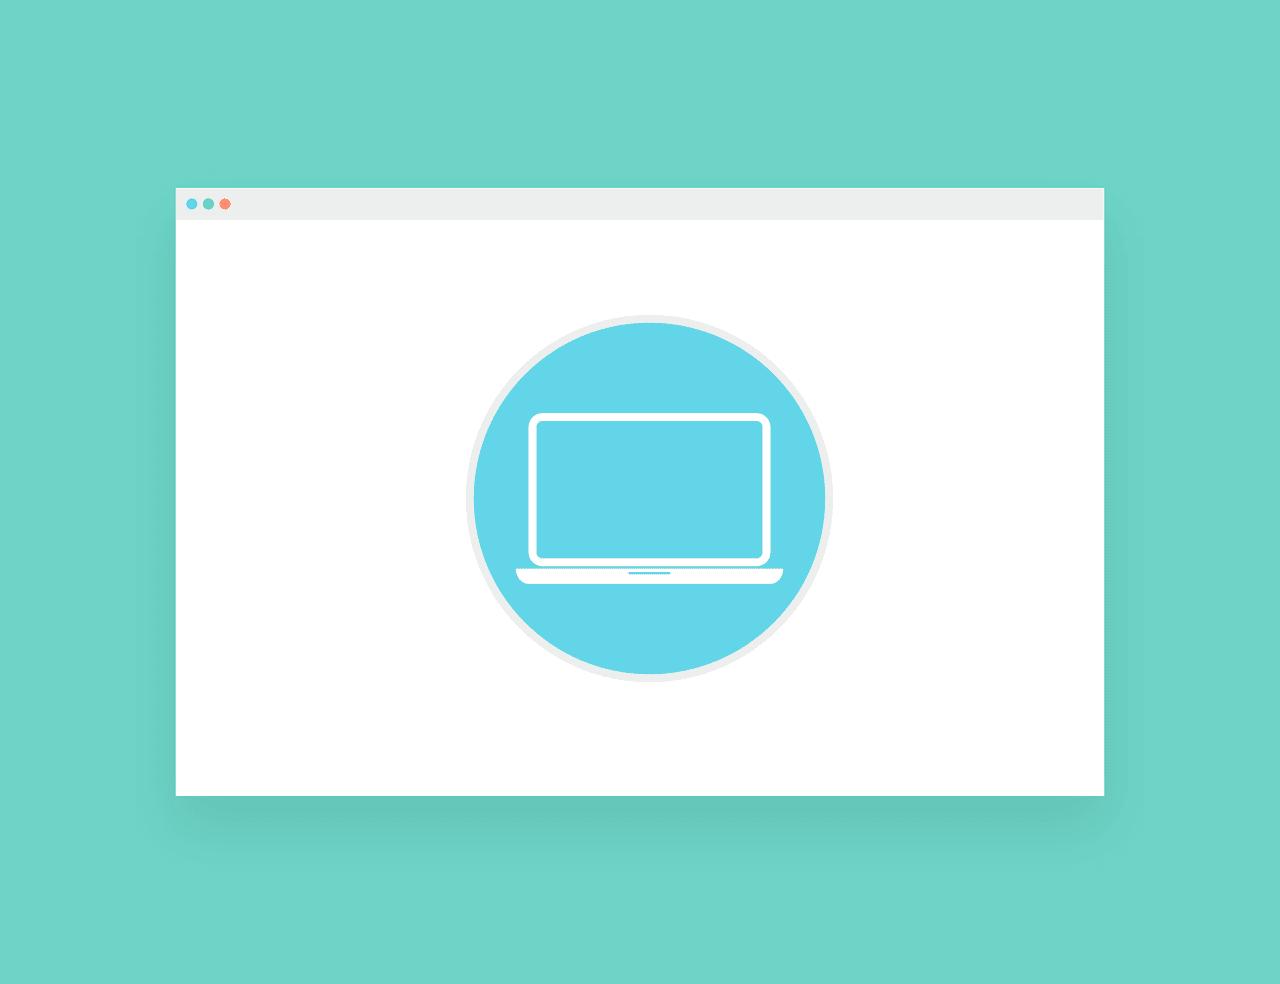 Solusi Tampilan Windows Besar Setelah Install Ulang  (Jitu) 3 Solusi Tampilan Windows Besar Setelah Install Ulang